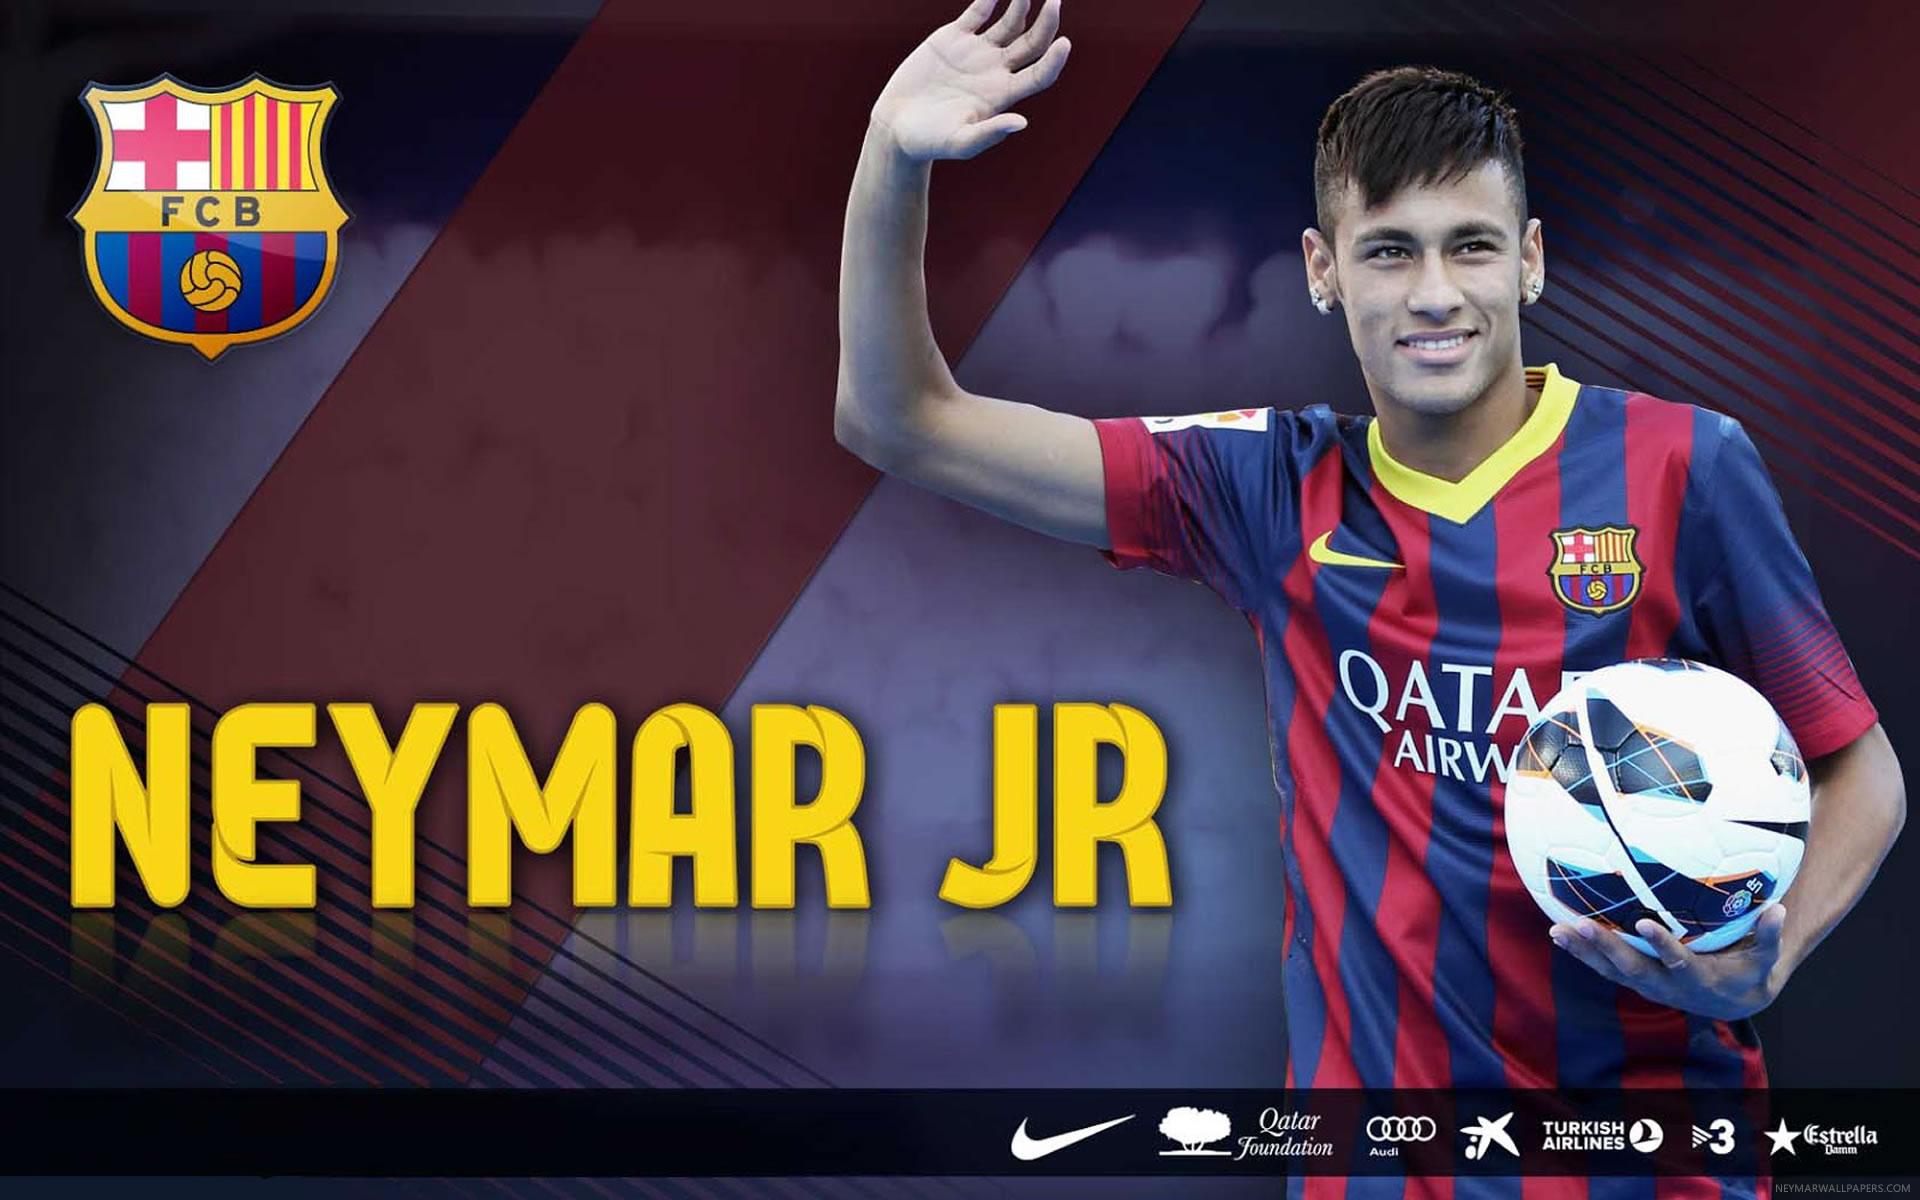 Neymar waving wallpaper